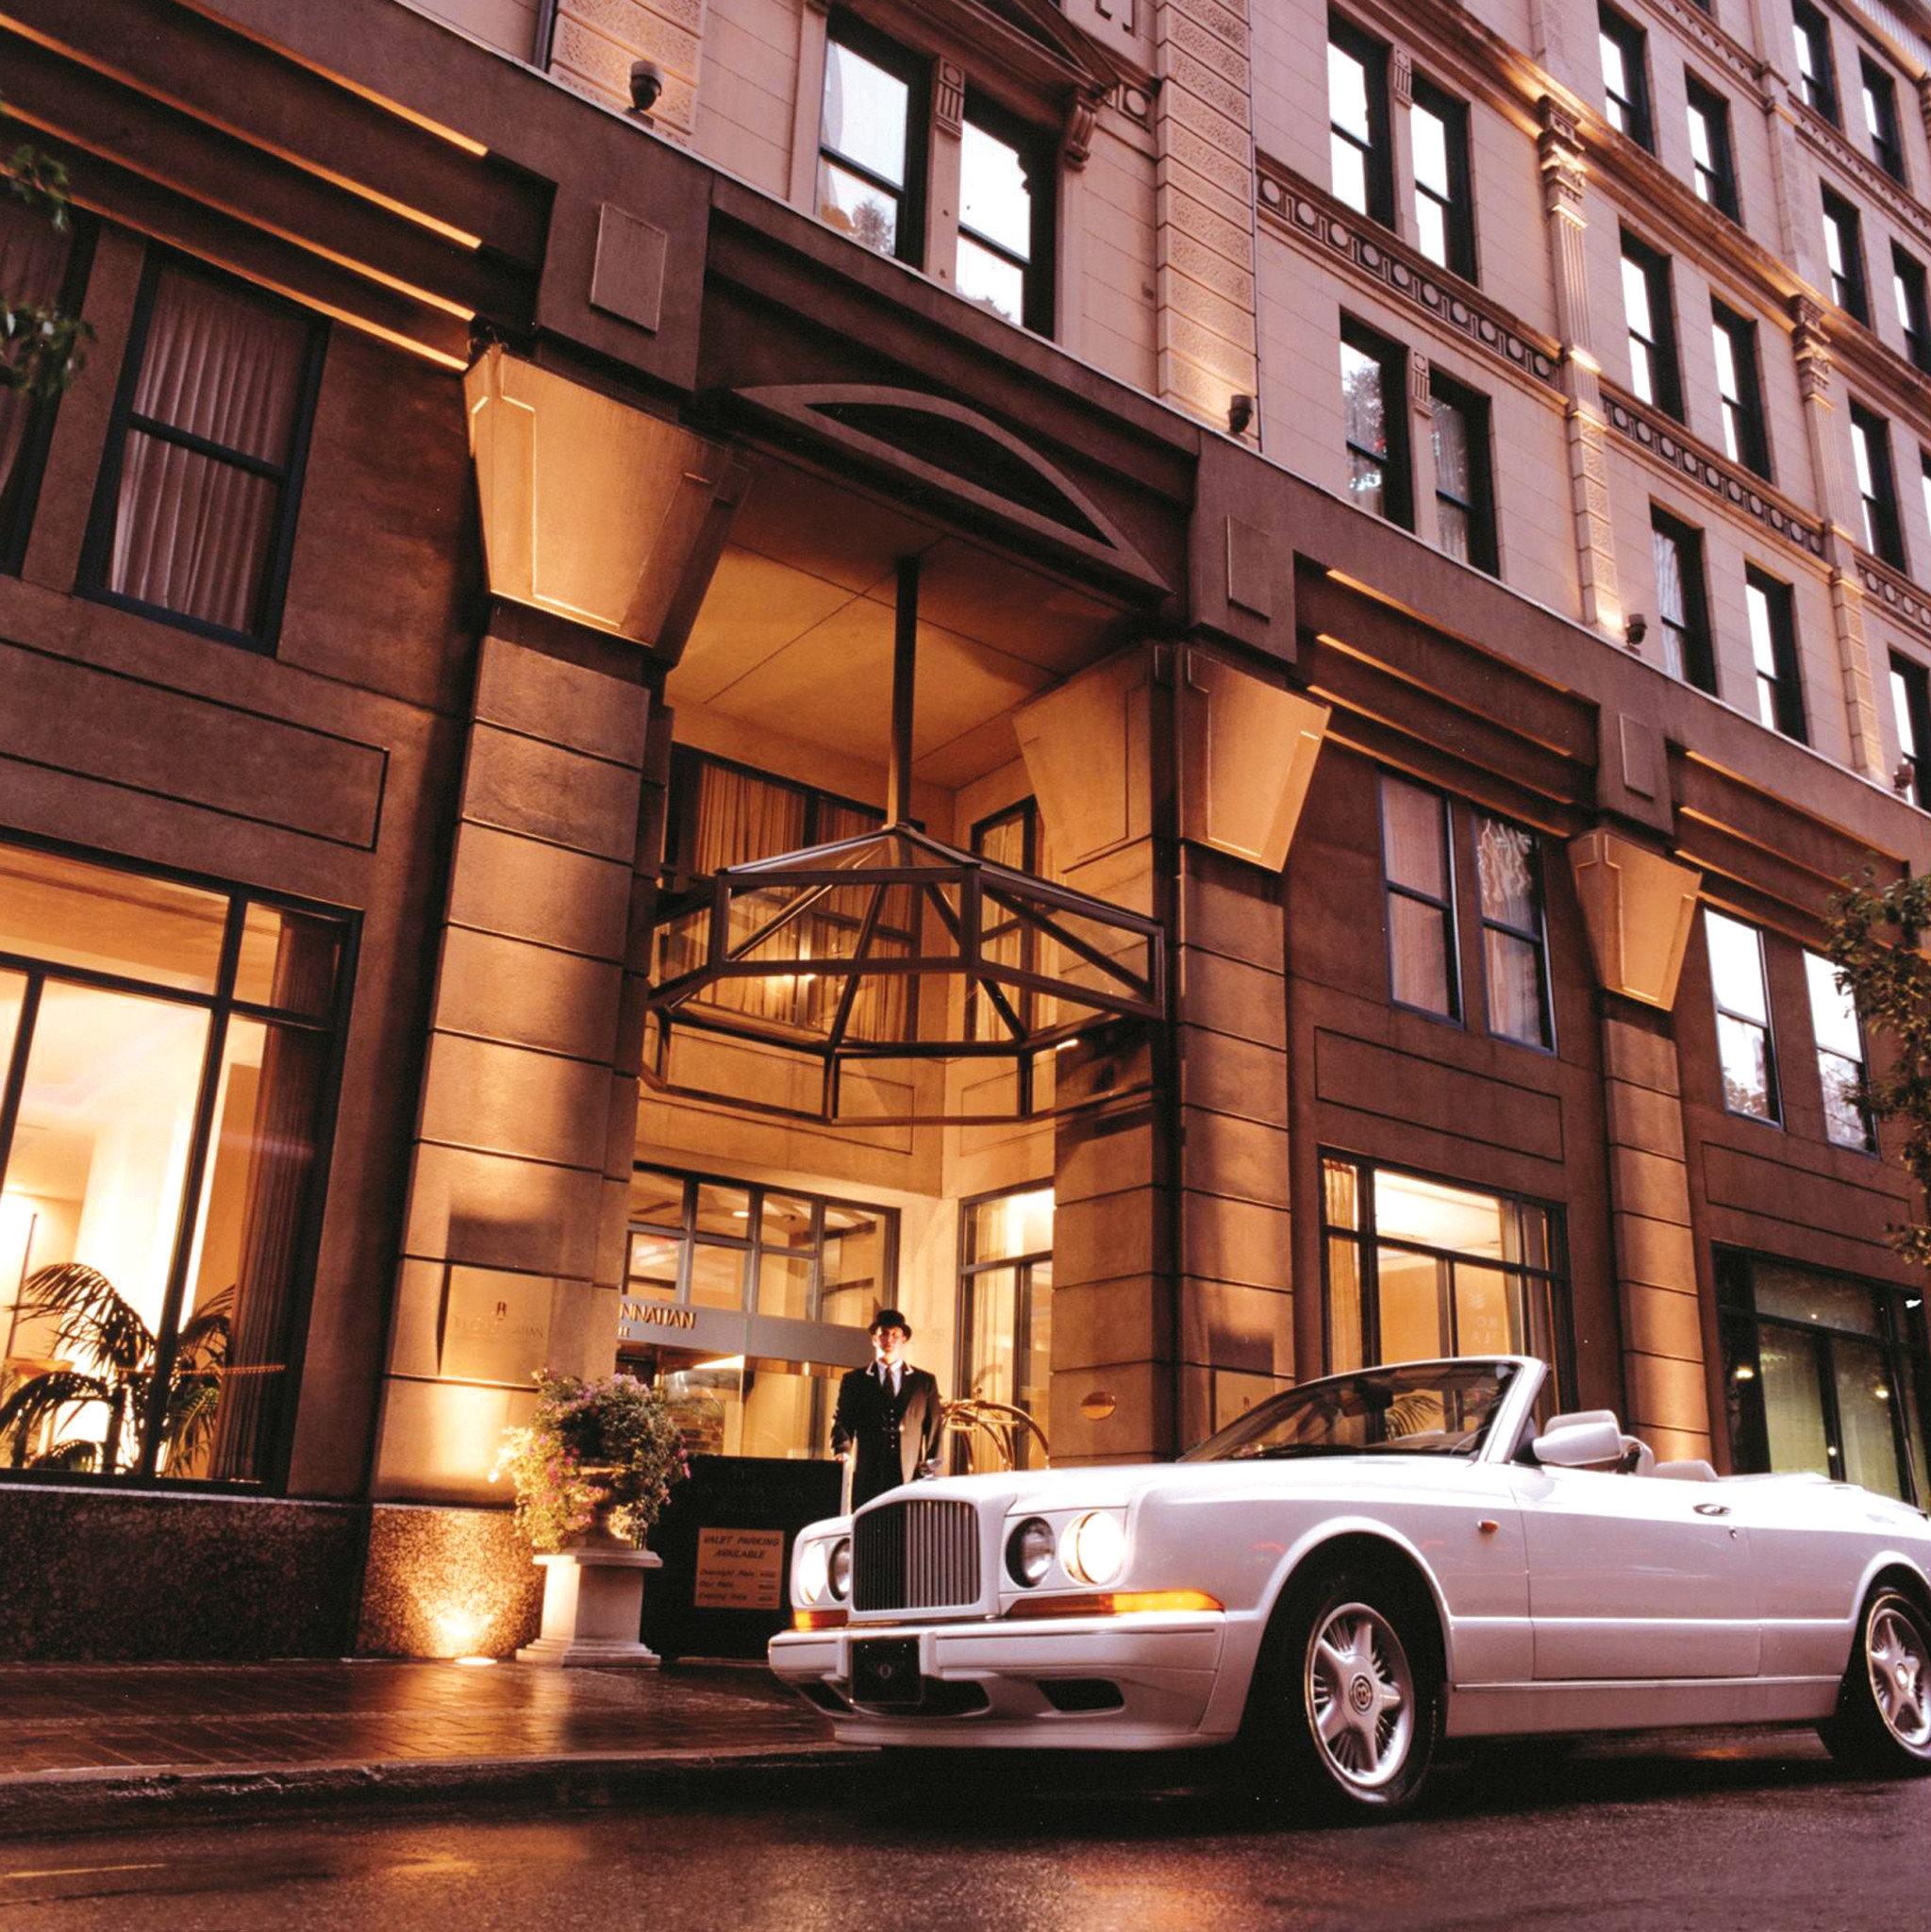 Elegant Exterior Historic Modern building road street car vehicle luxury vehicle City